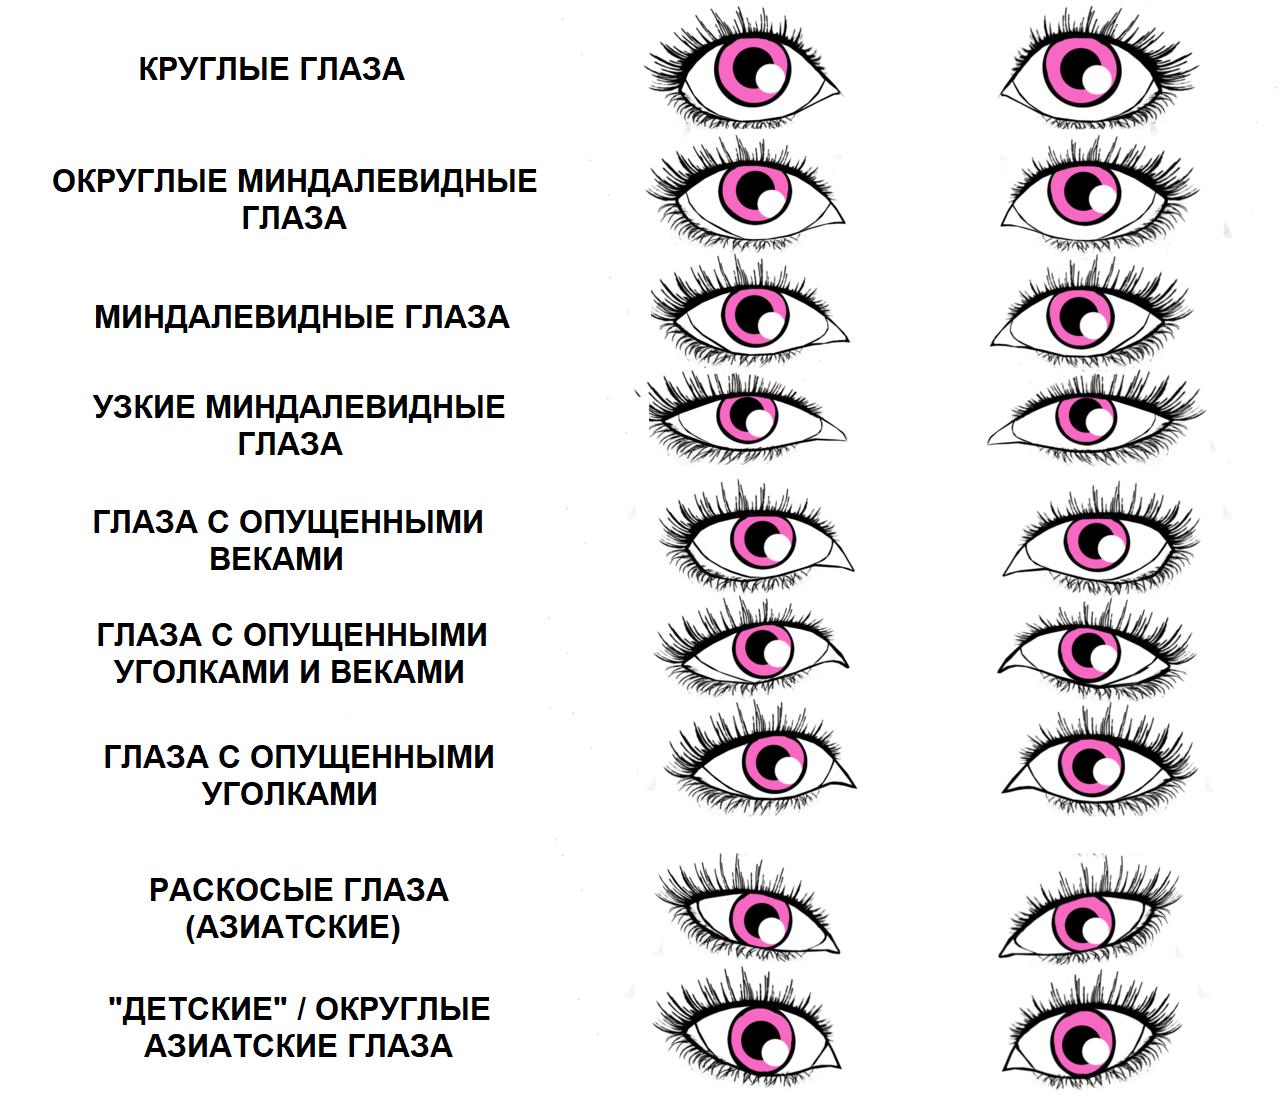 виды глаз